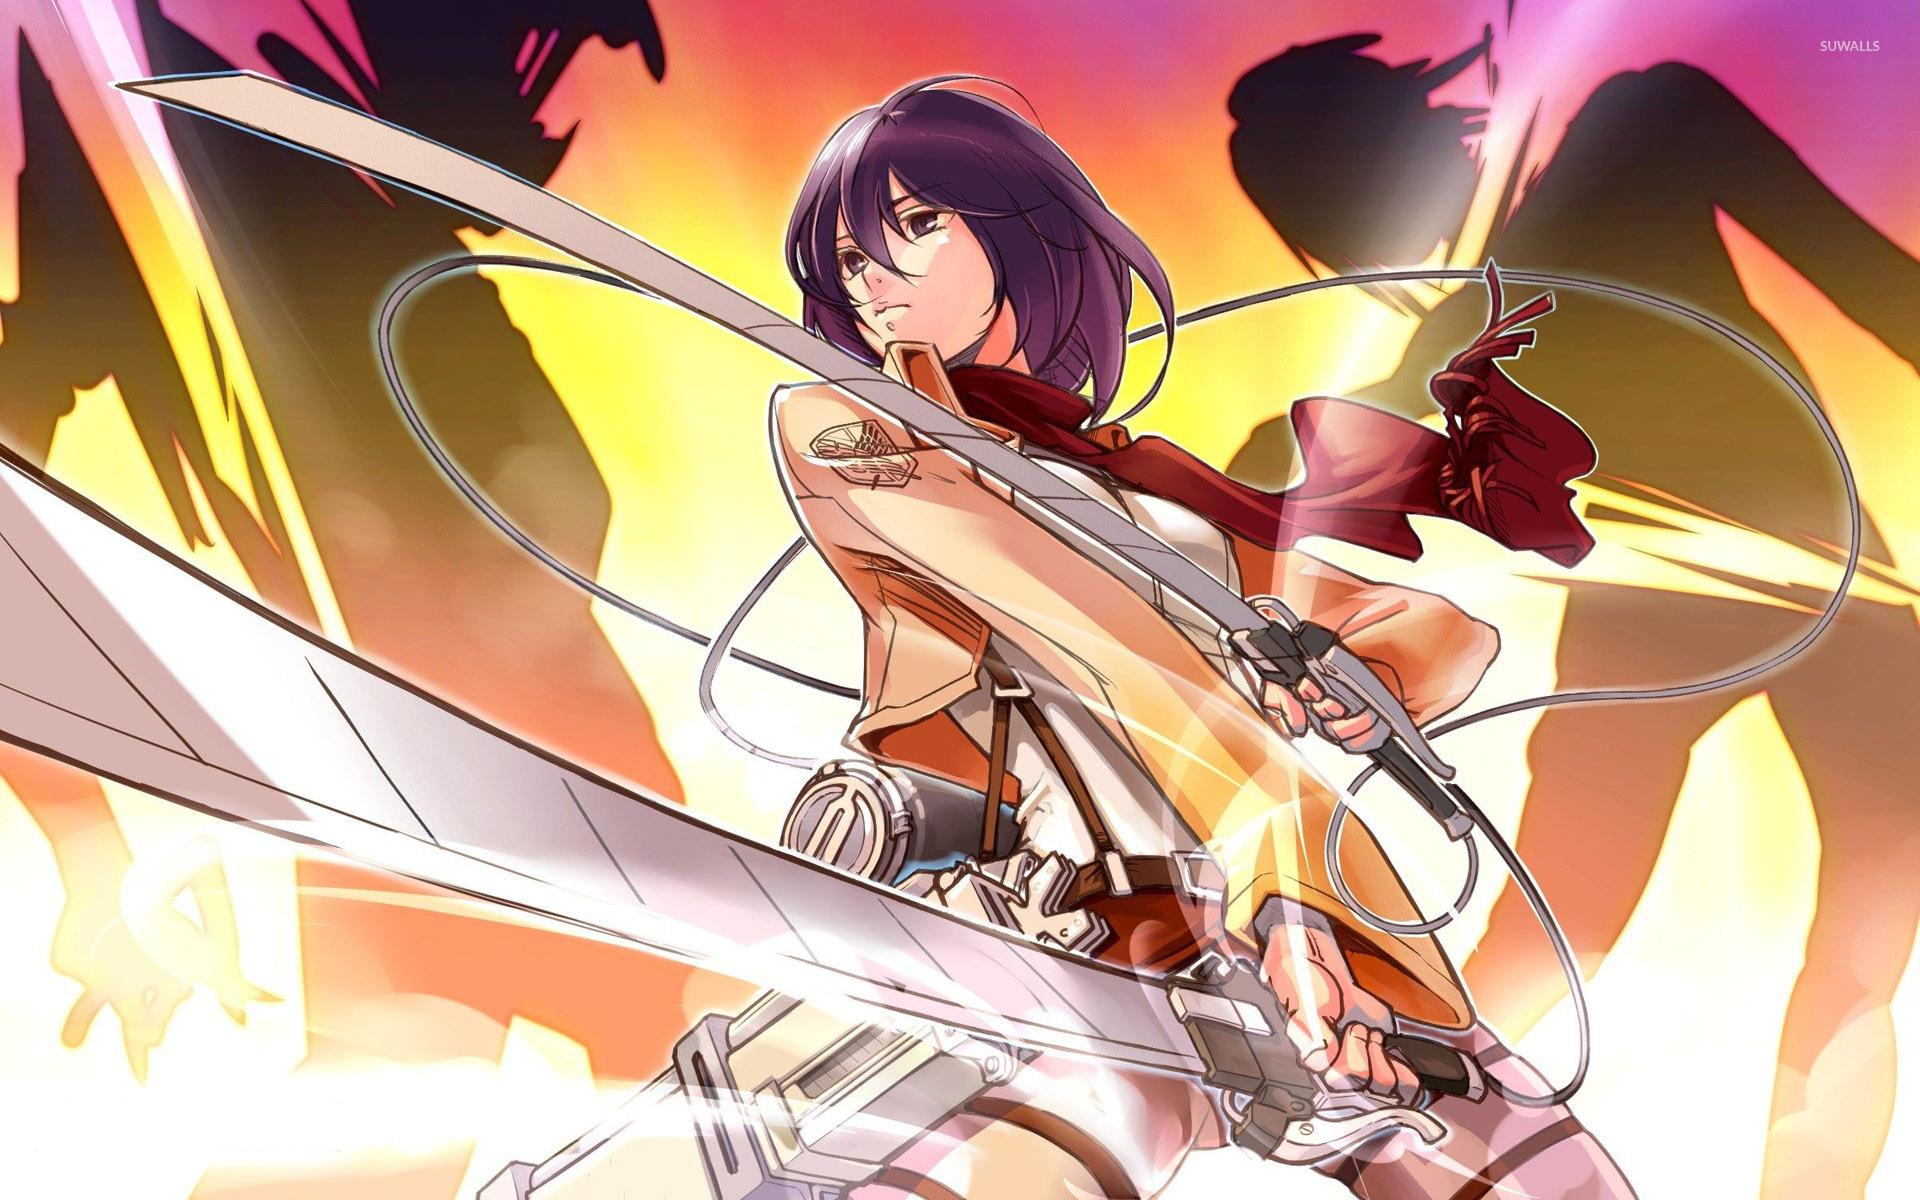 Mikasa Ackerman - Attack on Titan wallpaper - Anime wallpapers ...